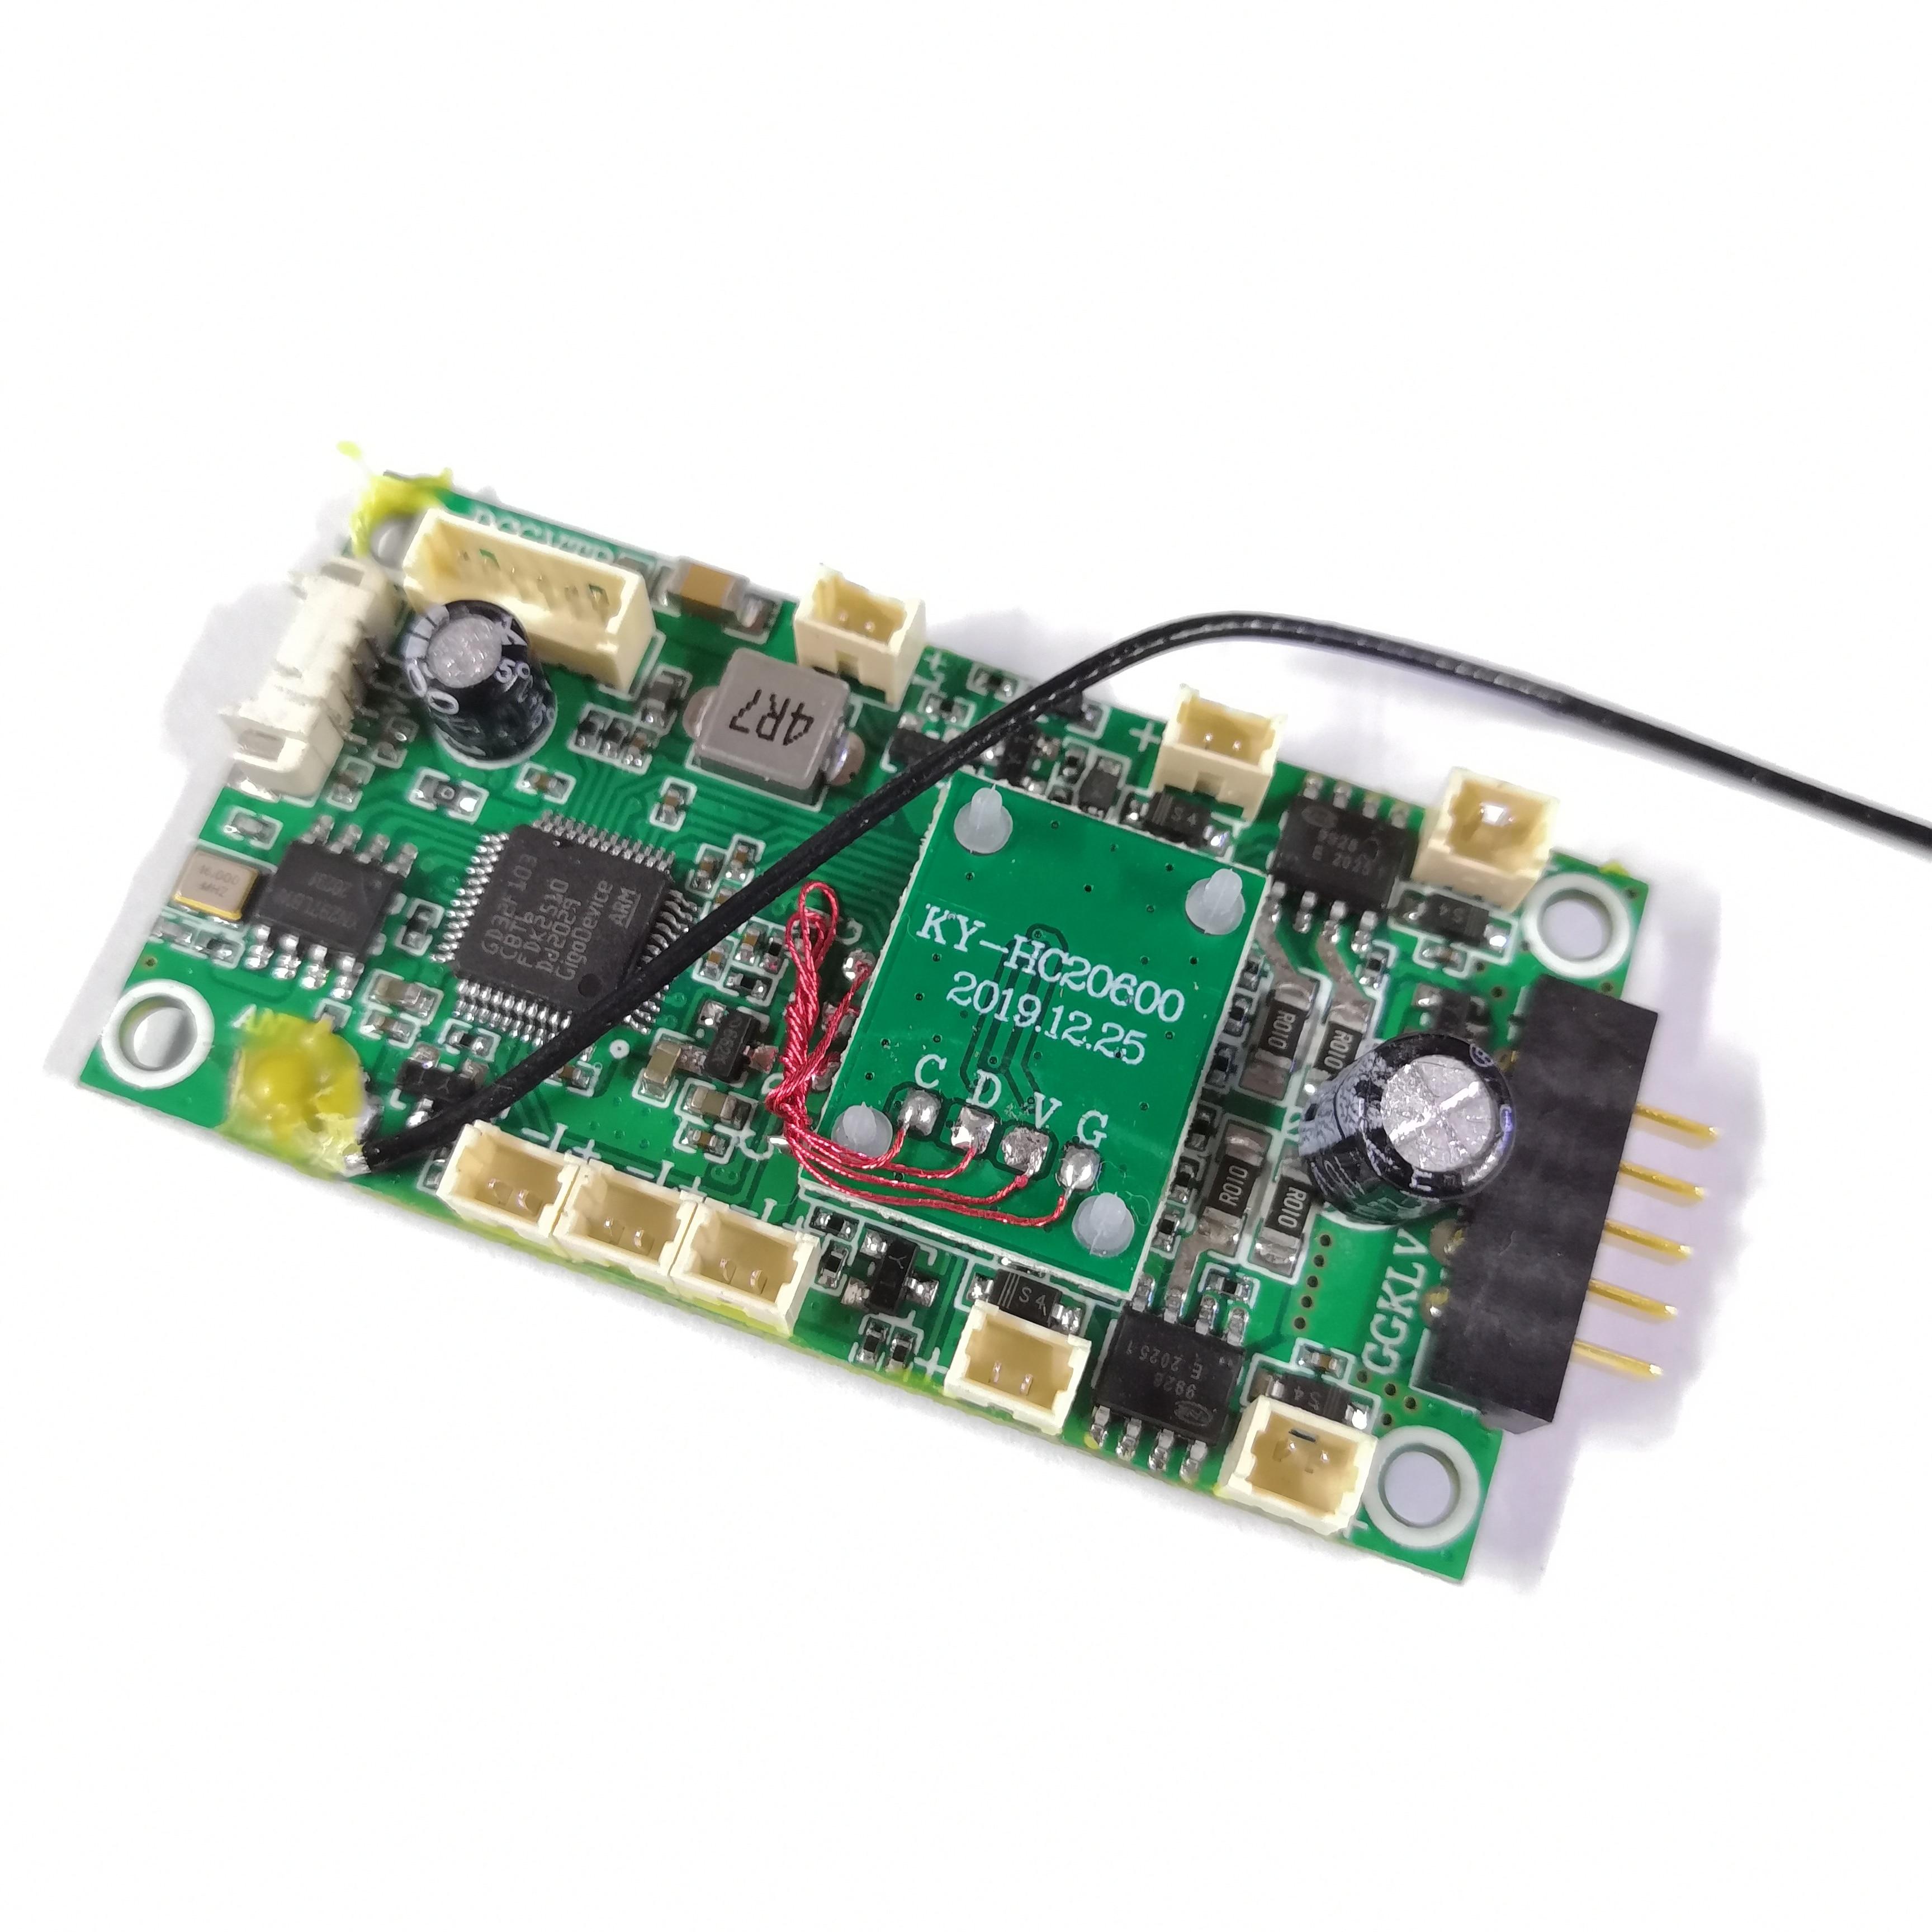 F3 GPS 4K Rc Drone Nocchi Quadcopter Spare Parts PCB Board Motherboard Receiver